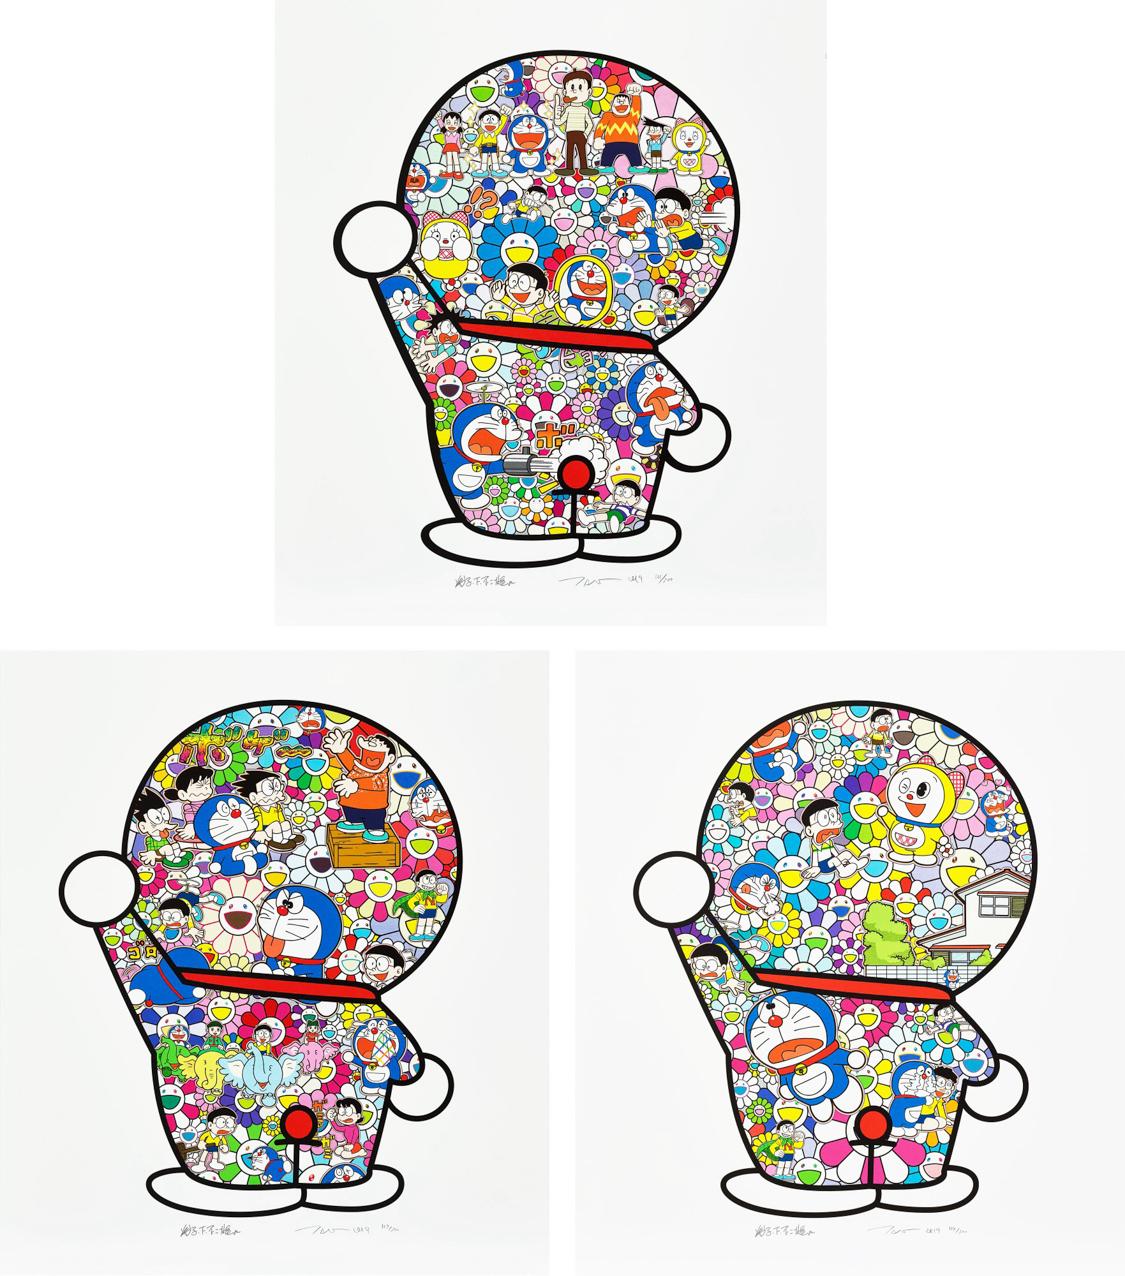 Doraemon in the Field of Flower / Mr. Fujiko F. Fujio and Doraemon Are in the Field of Flowers / Doraemon's Daily life(一组三件)